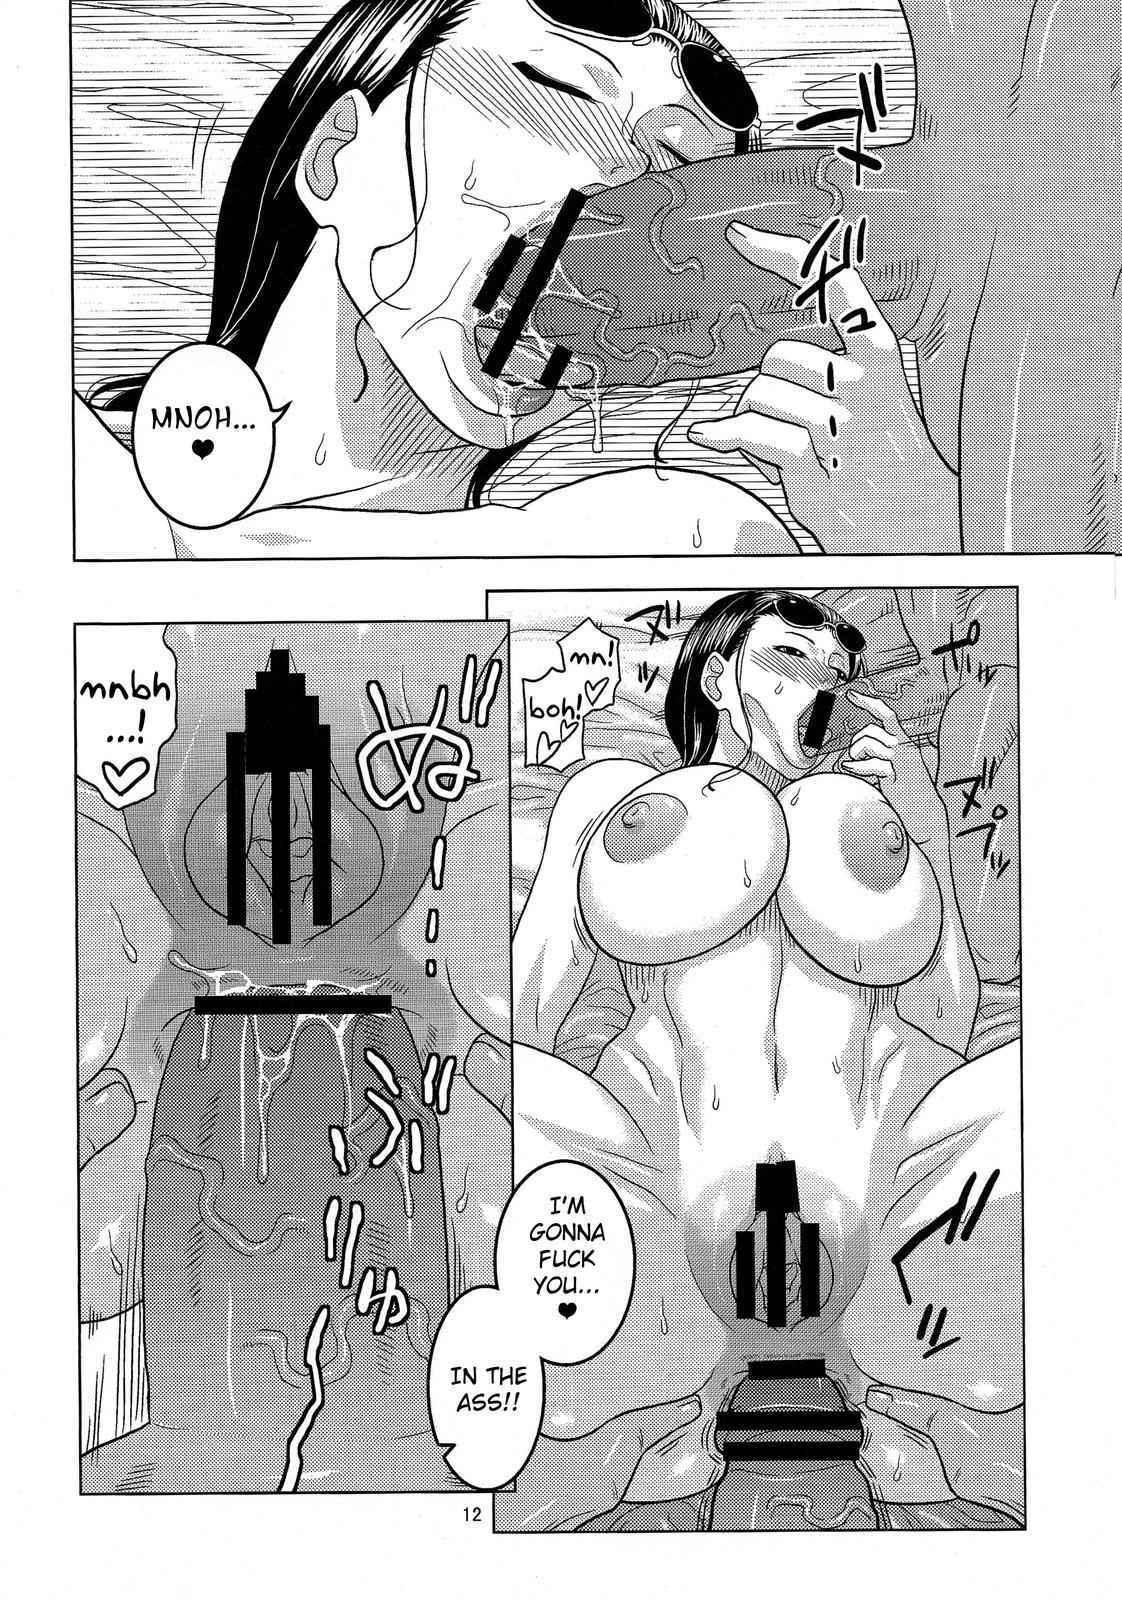 Nami Robi Chapter 5 12